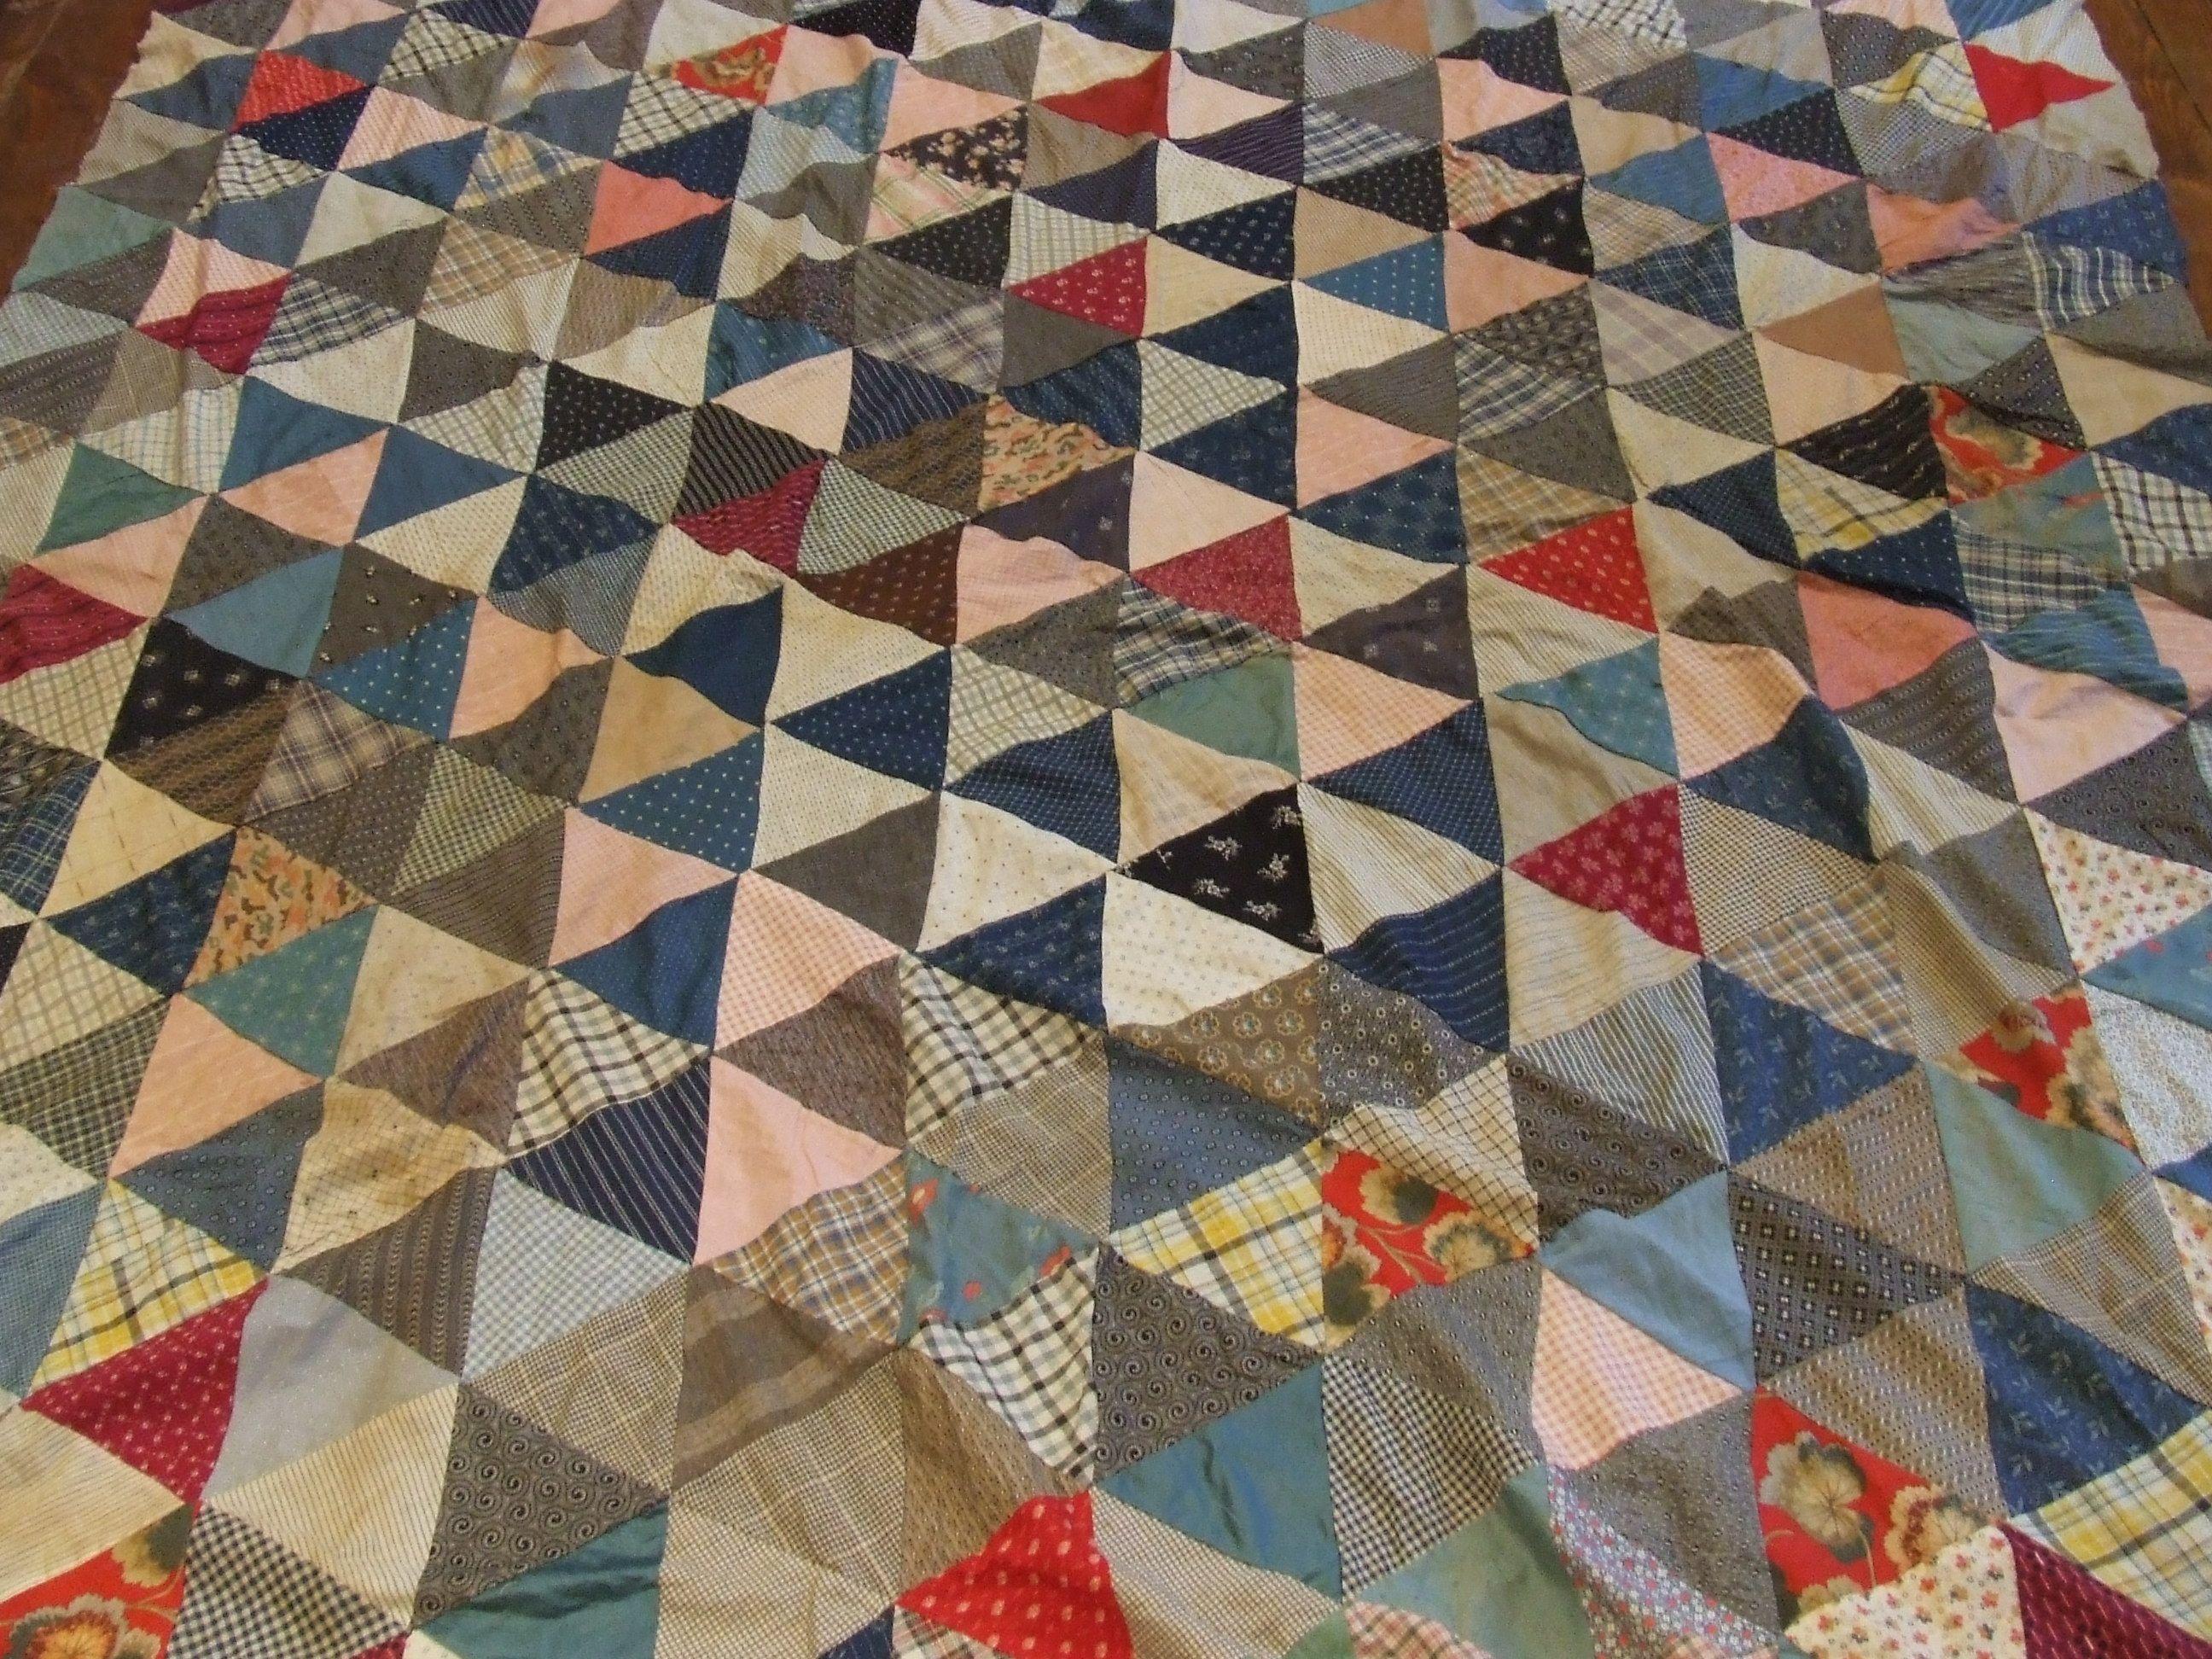 vintage quilts | Thousand Pyramids Antique Quilt Top | Tim Latimer ... : vintage quilt tops - Adamdwight.com